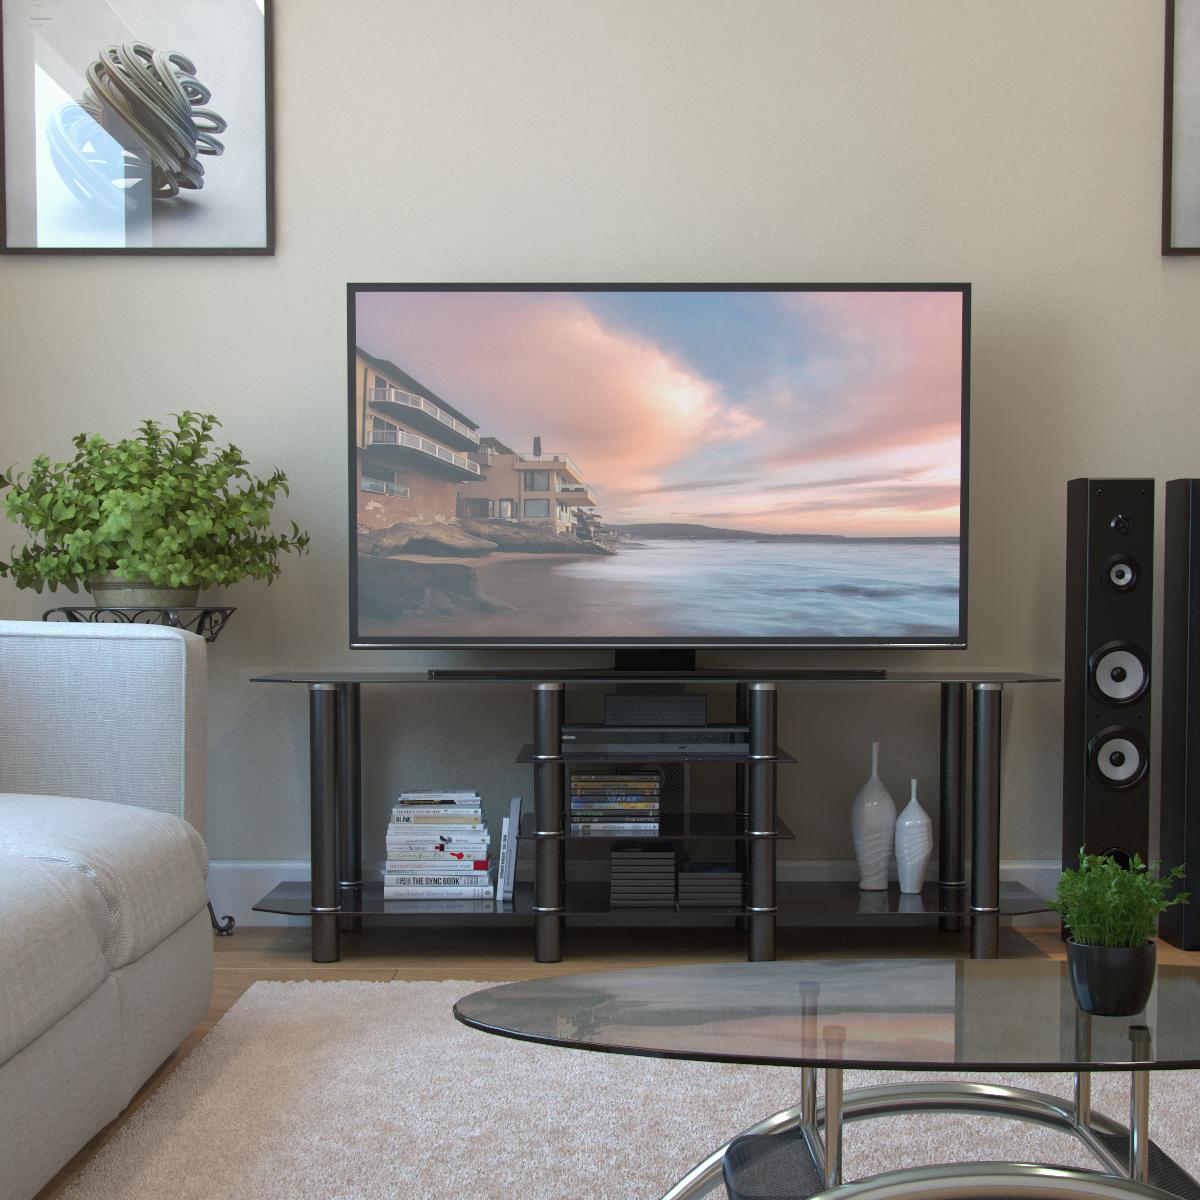 Salerno 60 Inch Glass TV Stand in Black